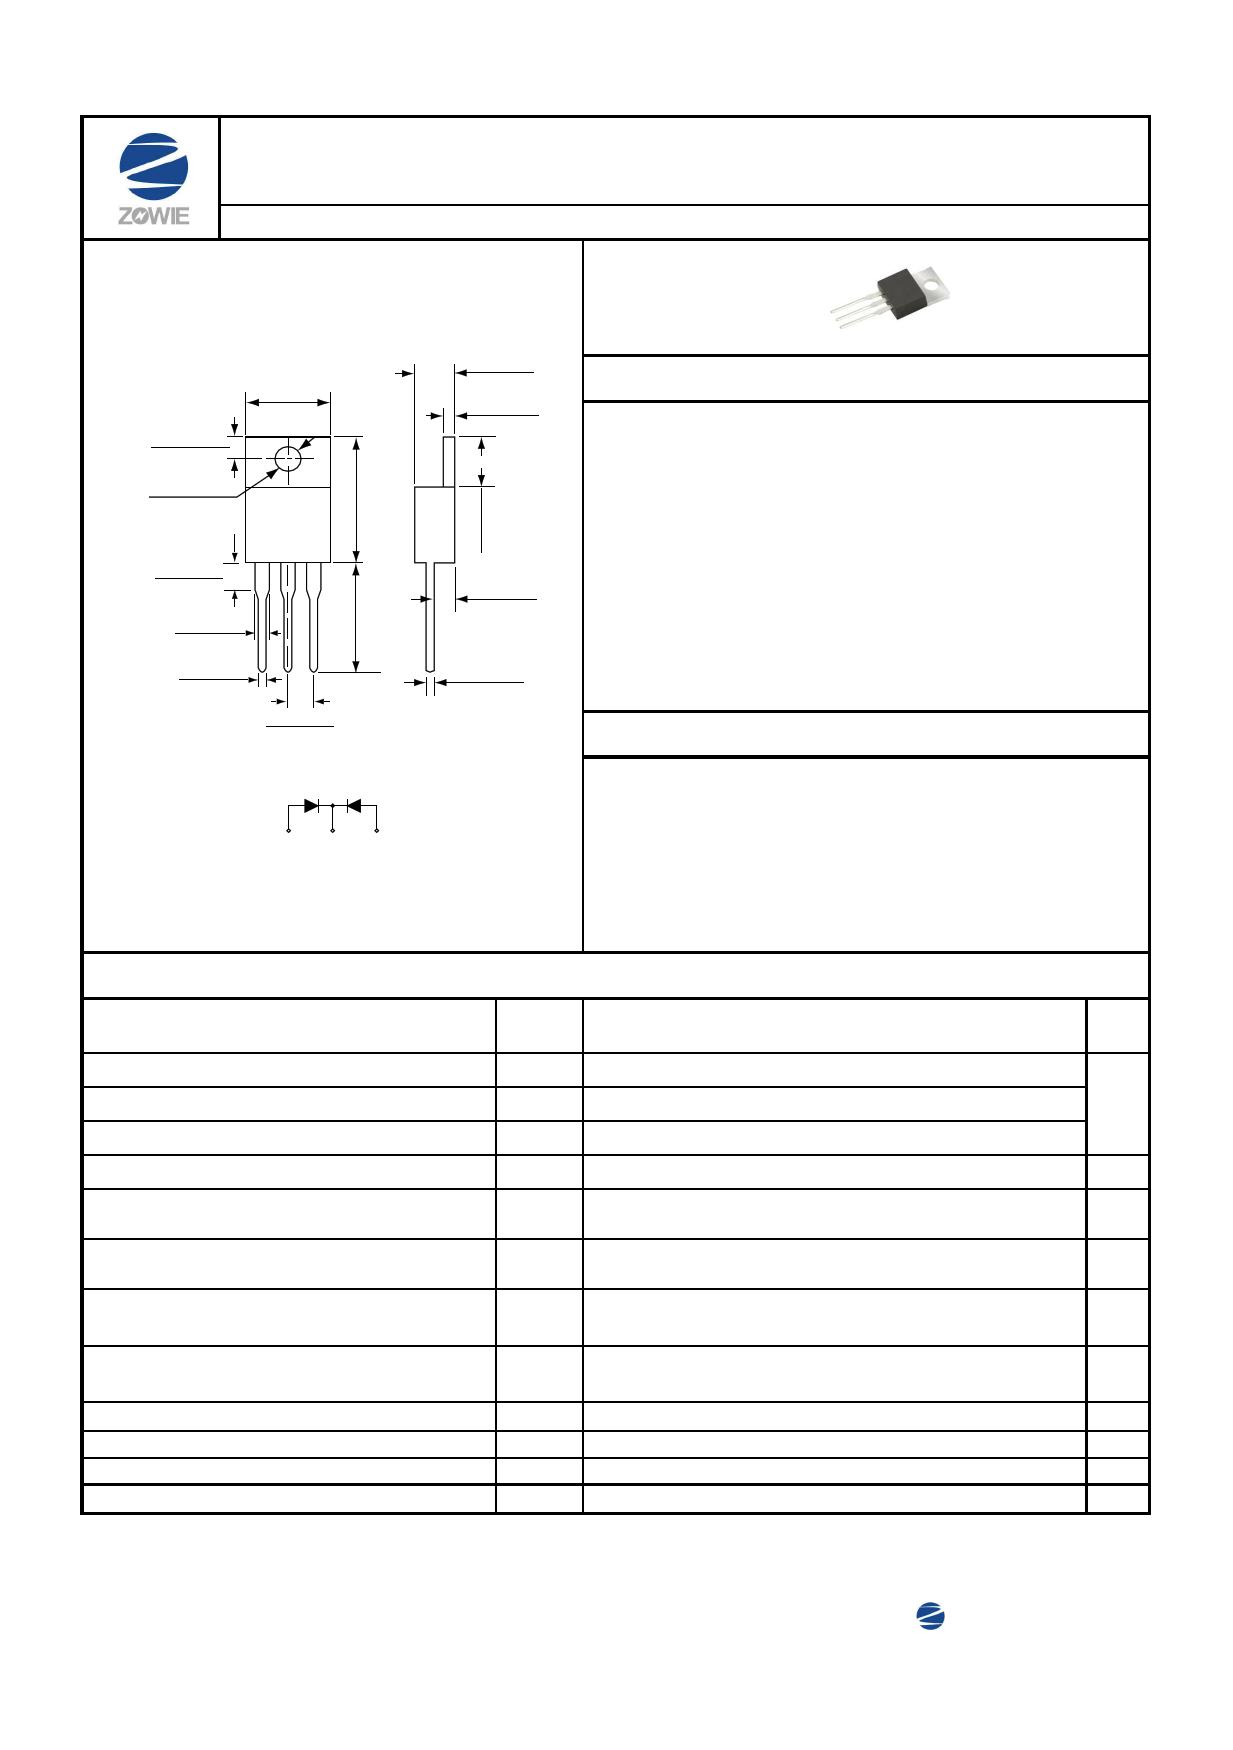 MBR30150CTSH Datasheet, MBR30150CTSH PDF,ピン配置, 機能